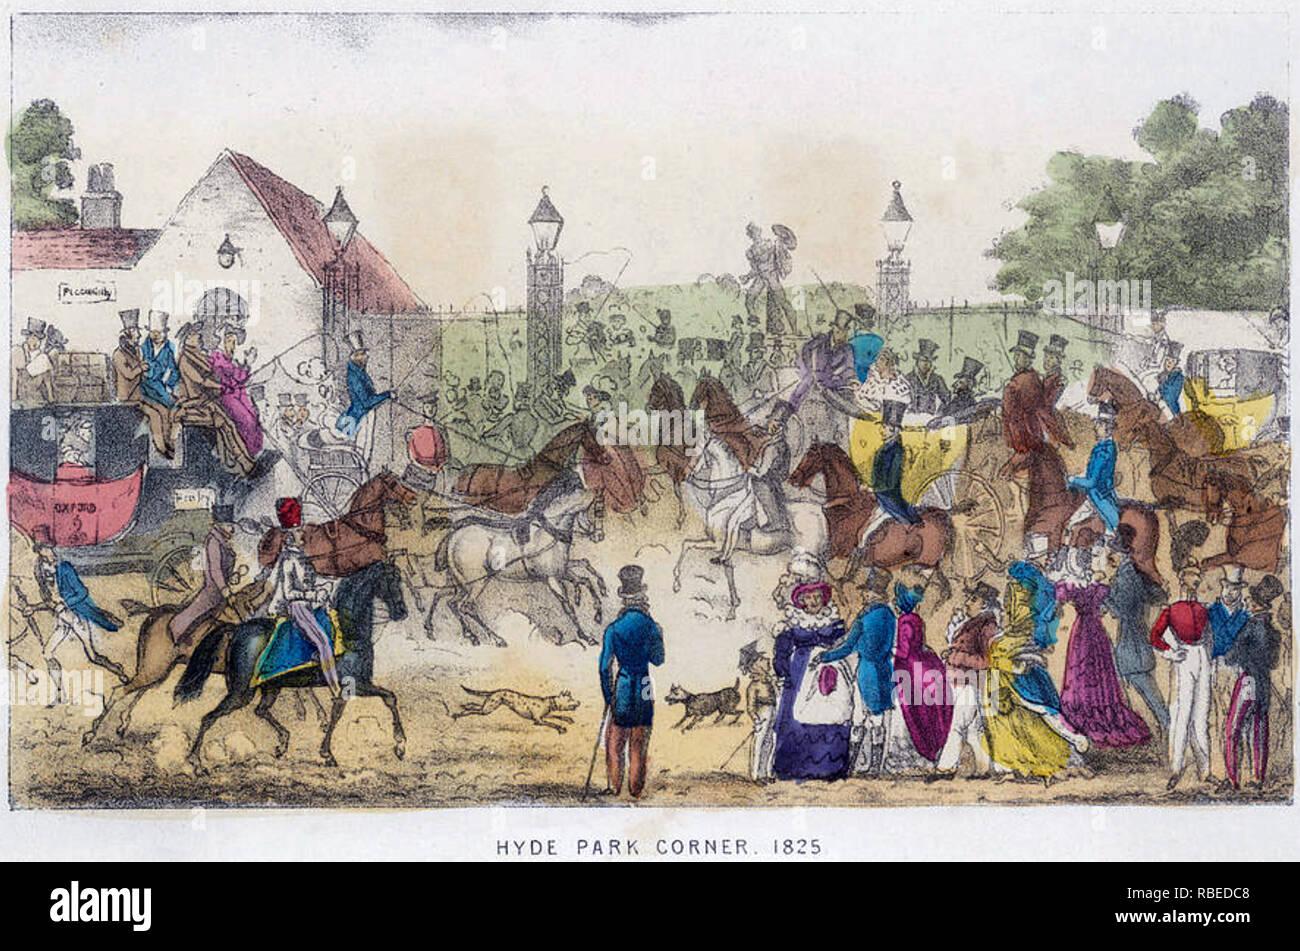 HYDE PARK CORNER,LONDON,1825 - Stock Image